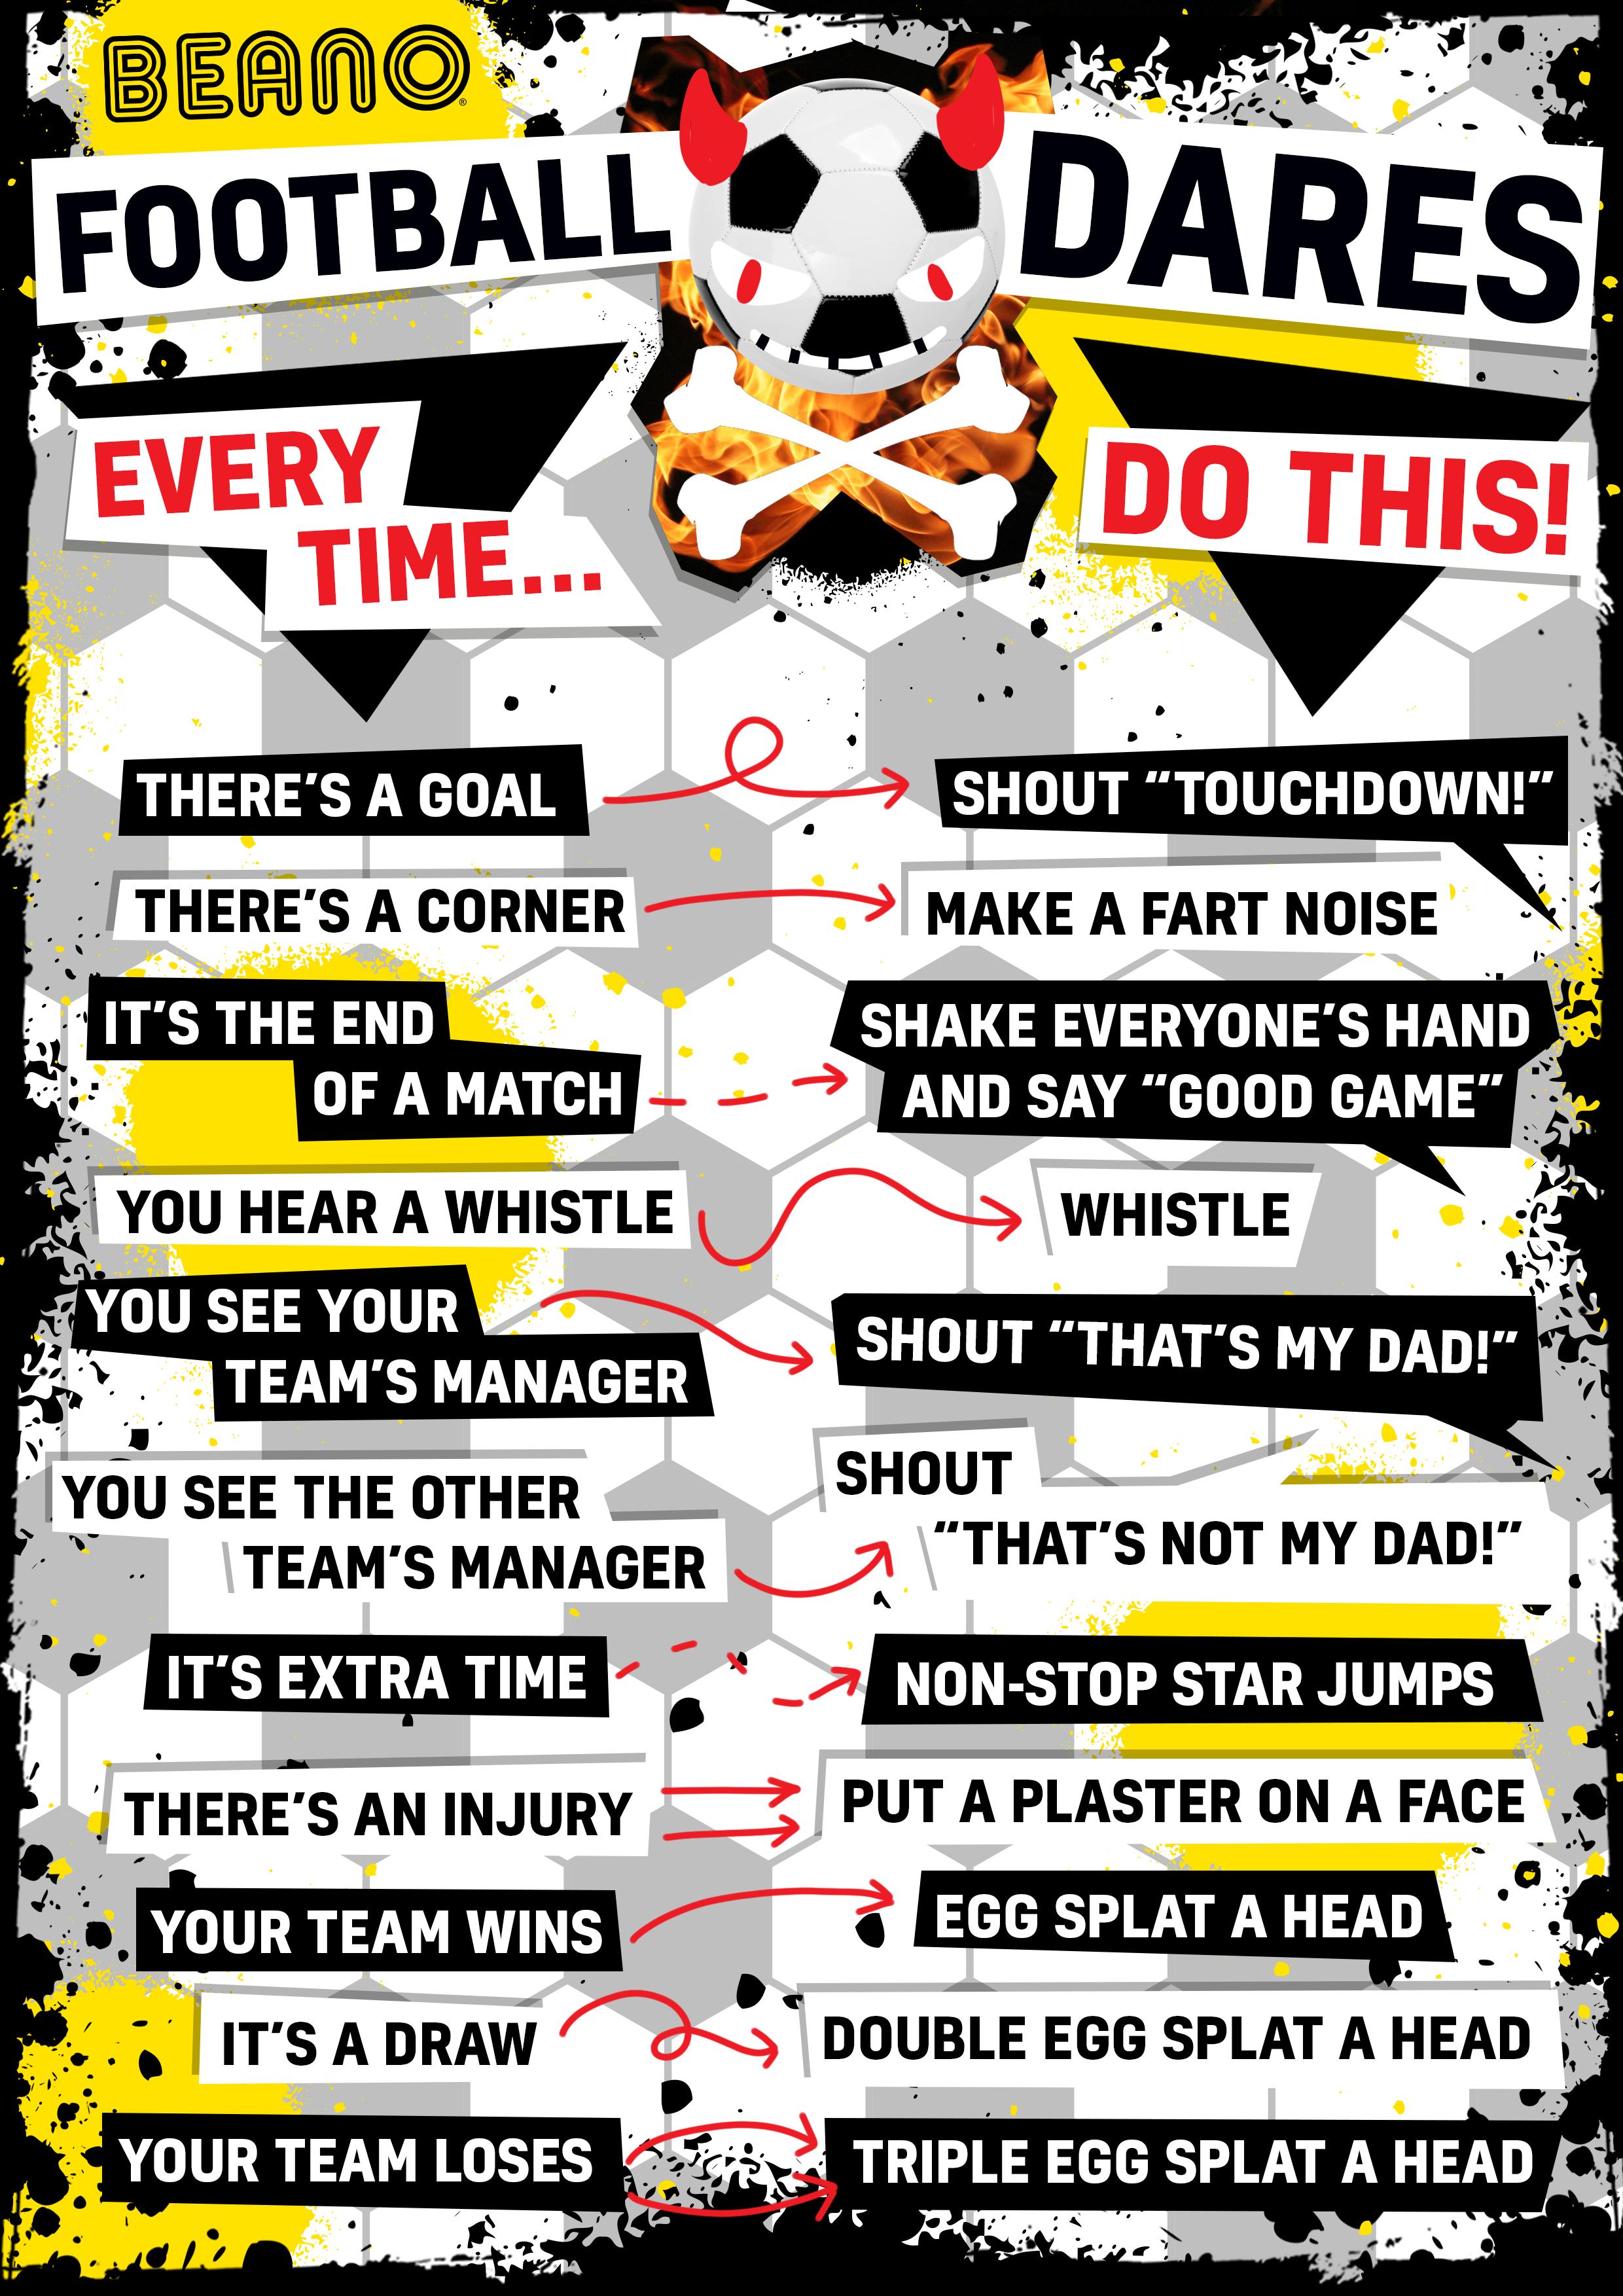 Football dares list